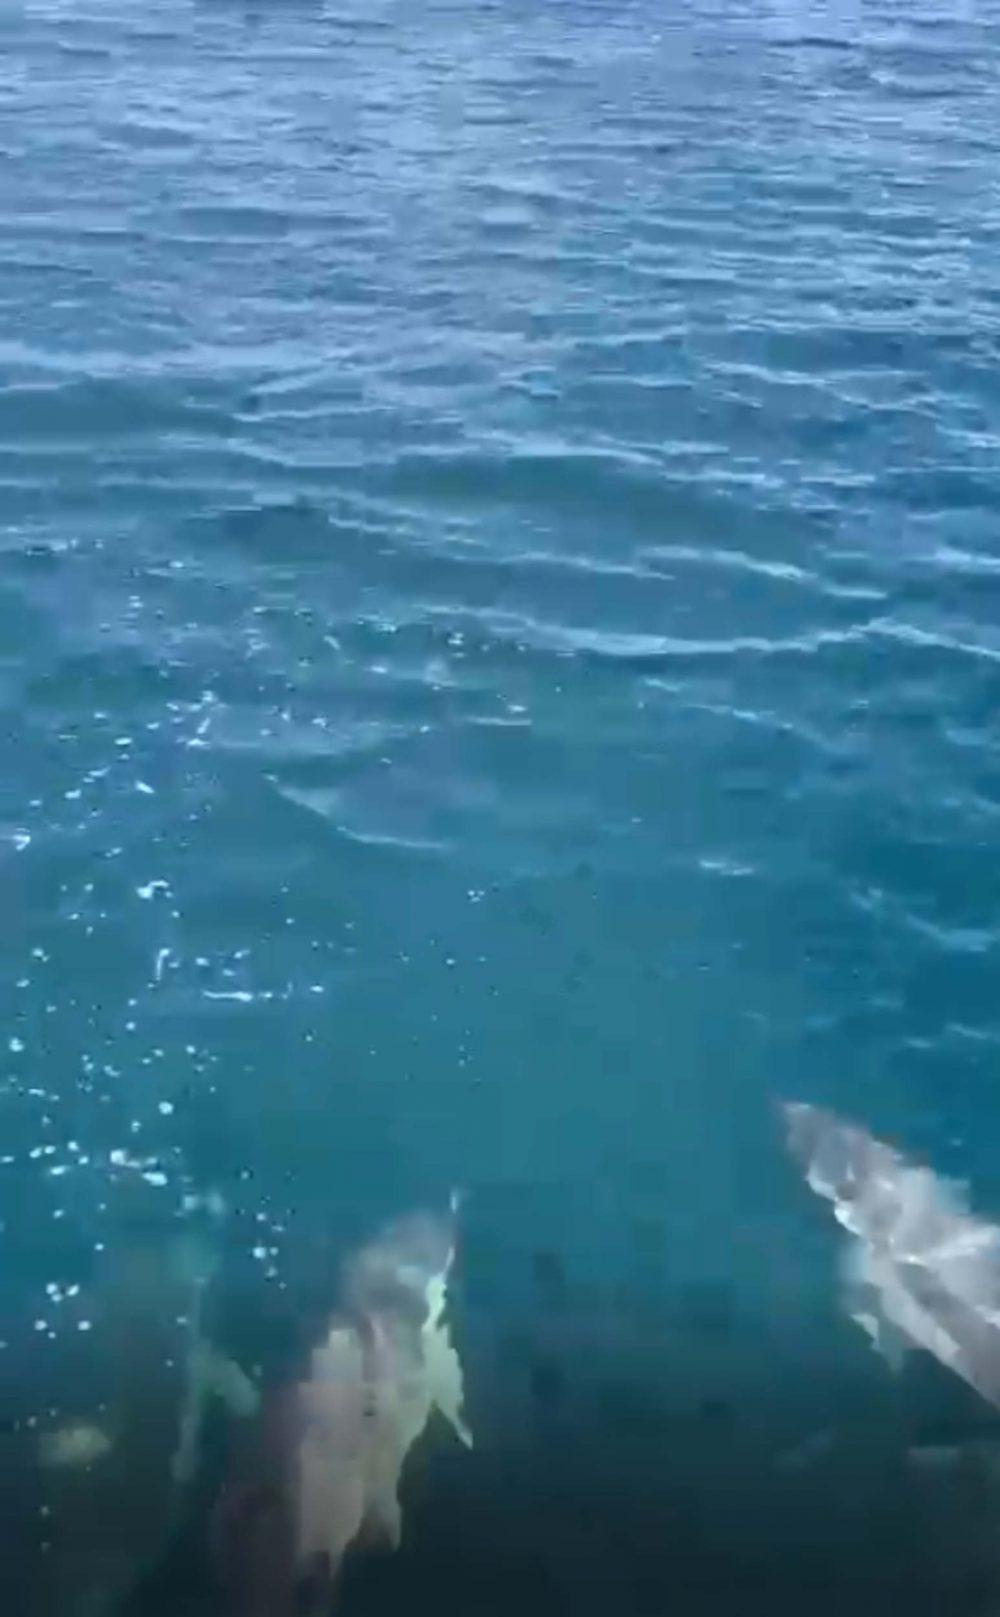 Dolphins under boat Skye - Wildlife News Scotland